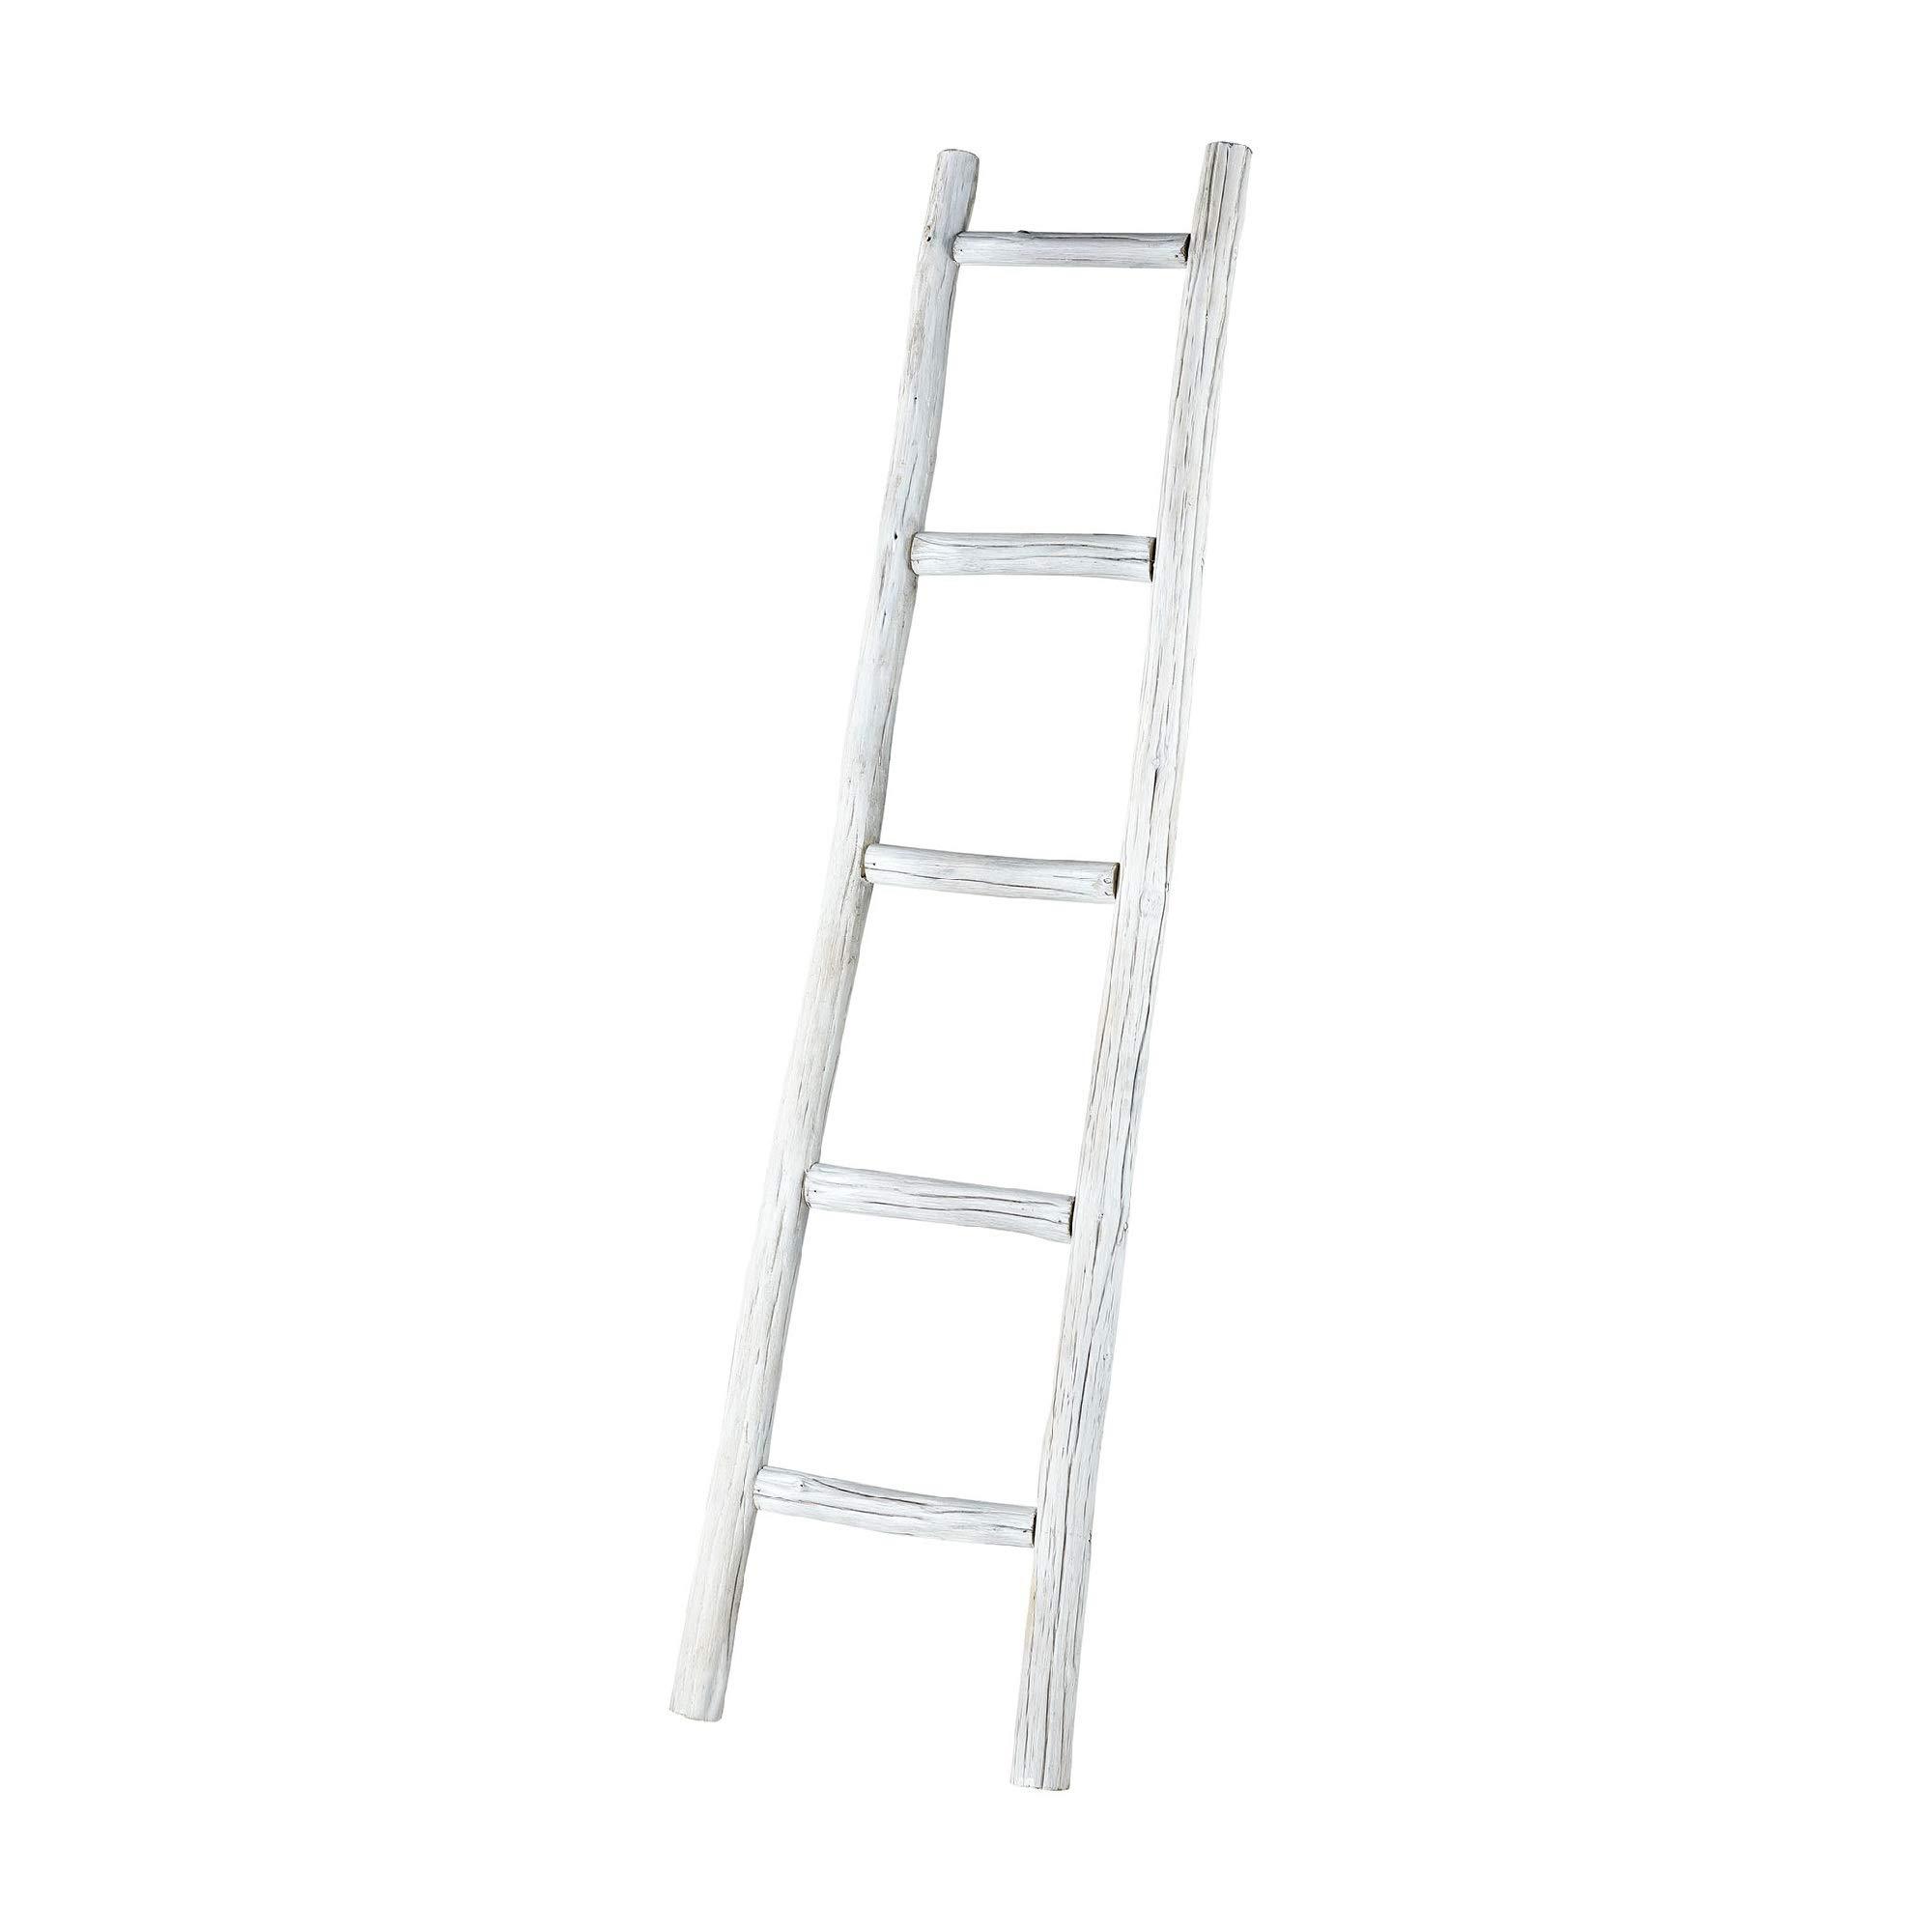 Contemporary Home Living 60'' Distressed White Wooden Display Rack Ladder by Contemporary Home Living